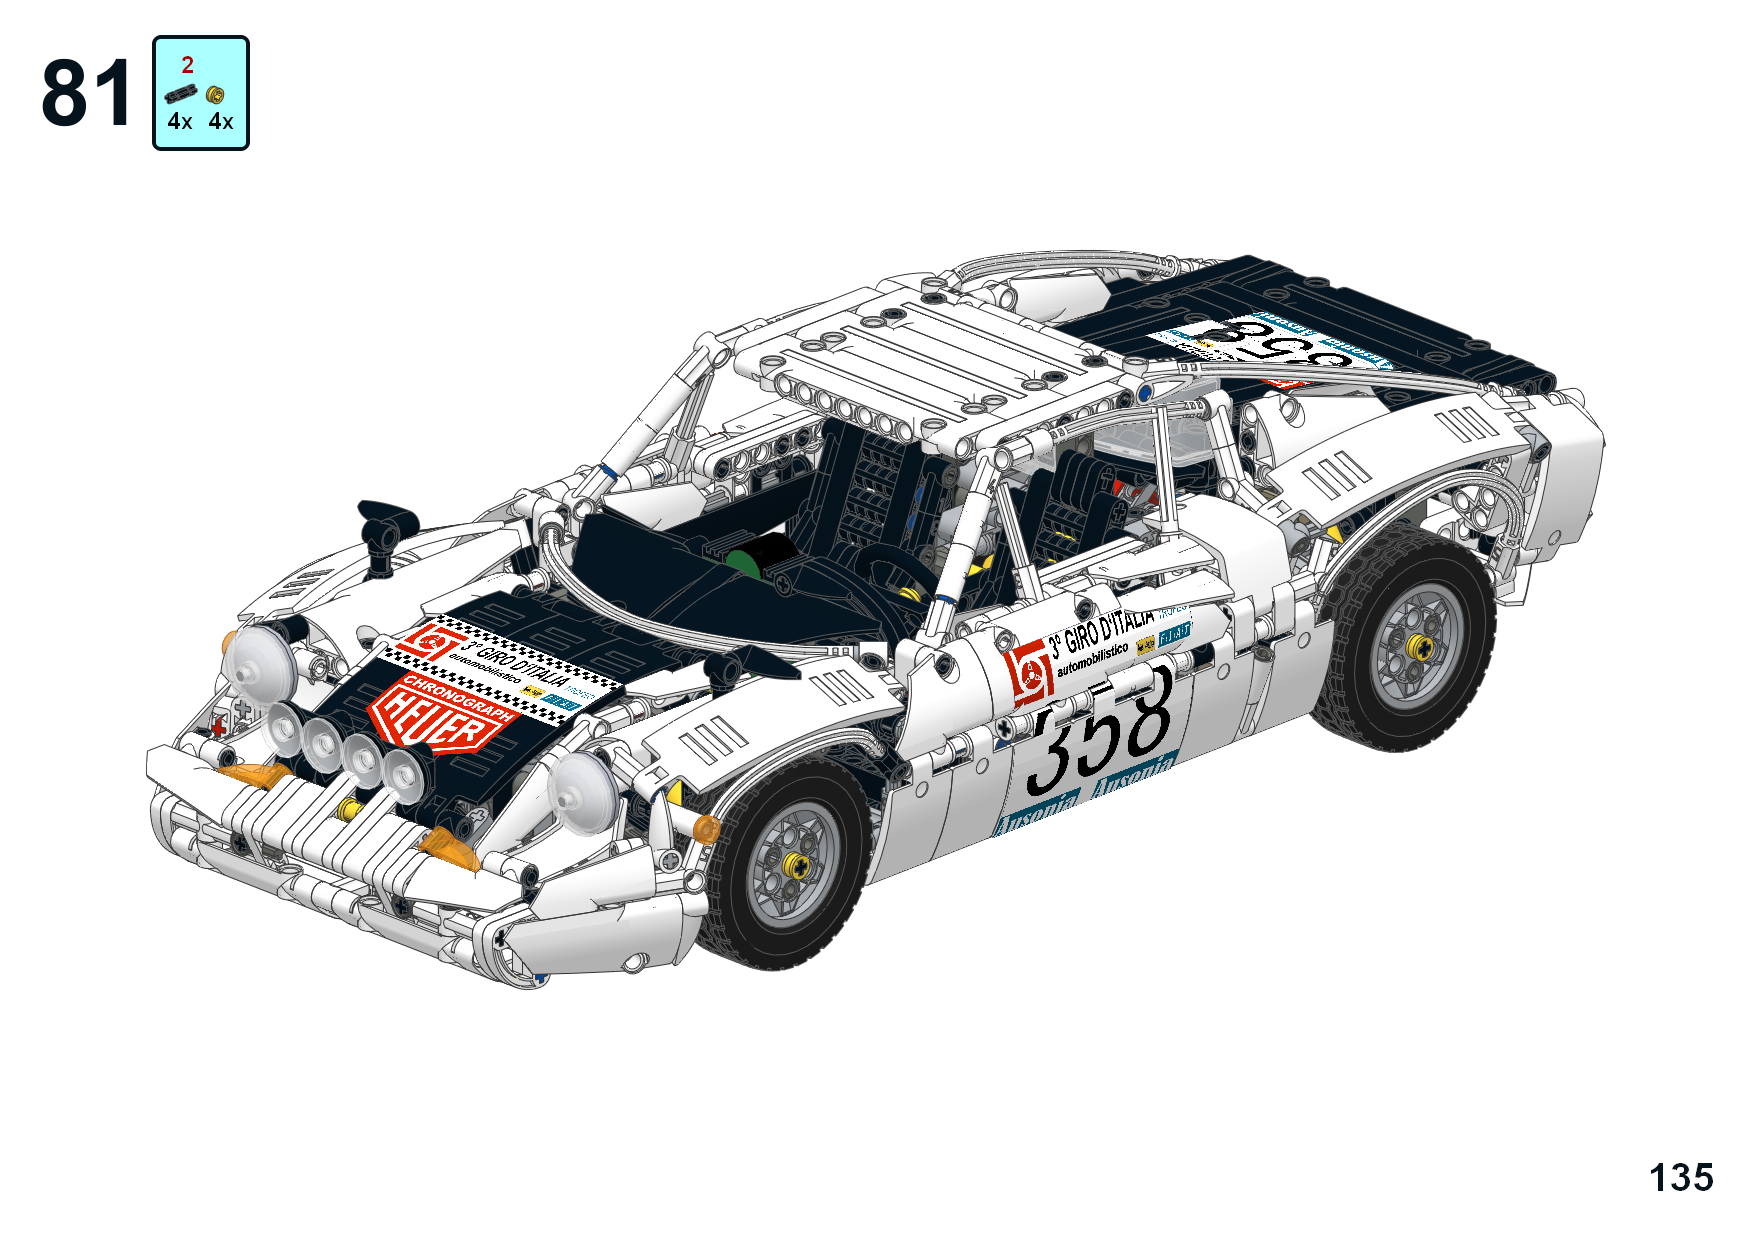 Ferrari%20dino%20246%20-%20Anson%20358_p